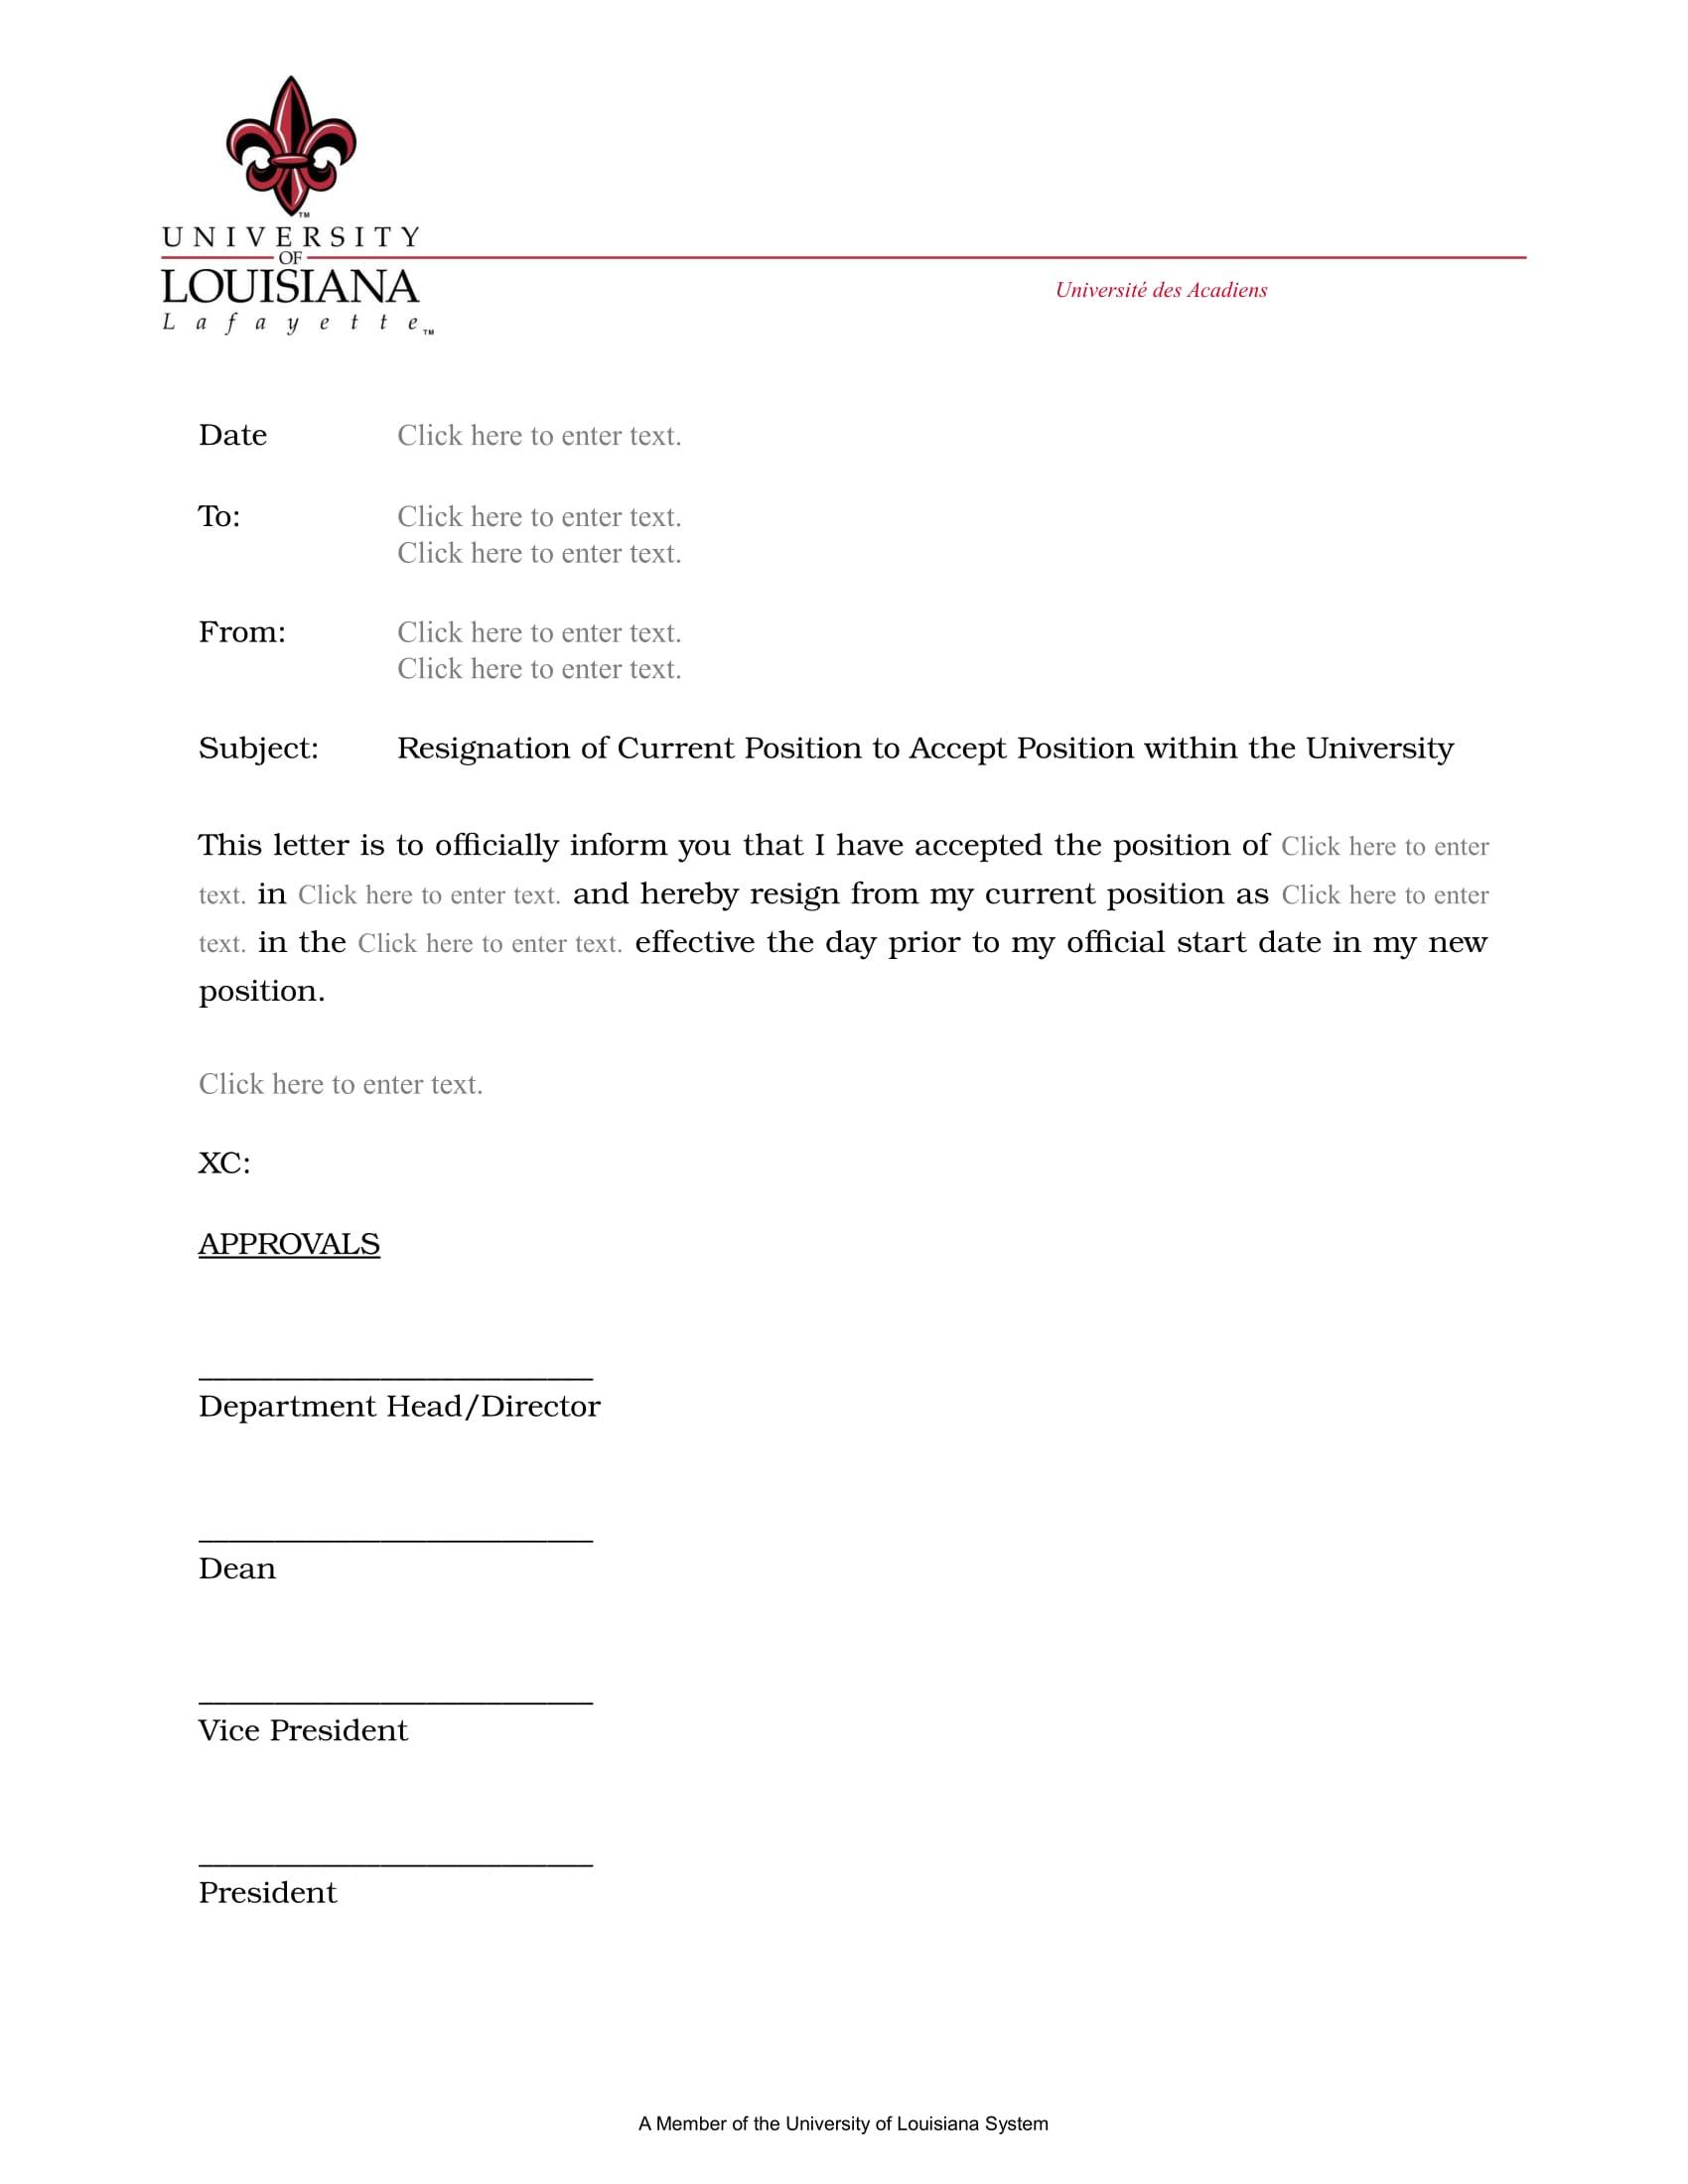 Resignation Letter Internal Transfer Resignation director of loss ...